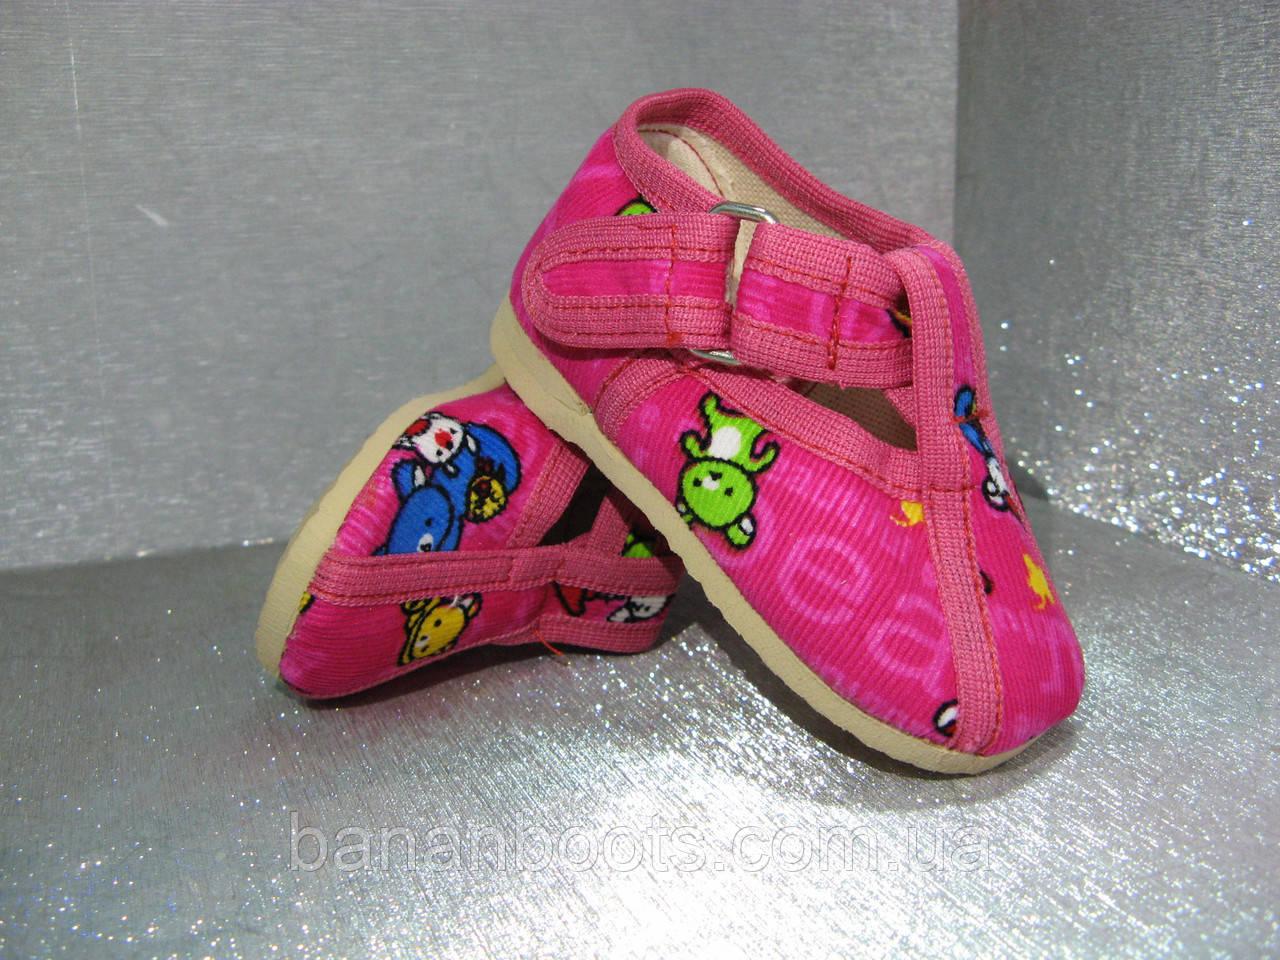 Тапочки детские розовые для девочки 20р. Украина